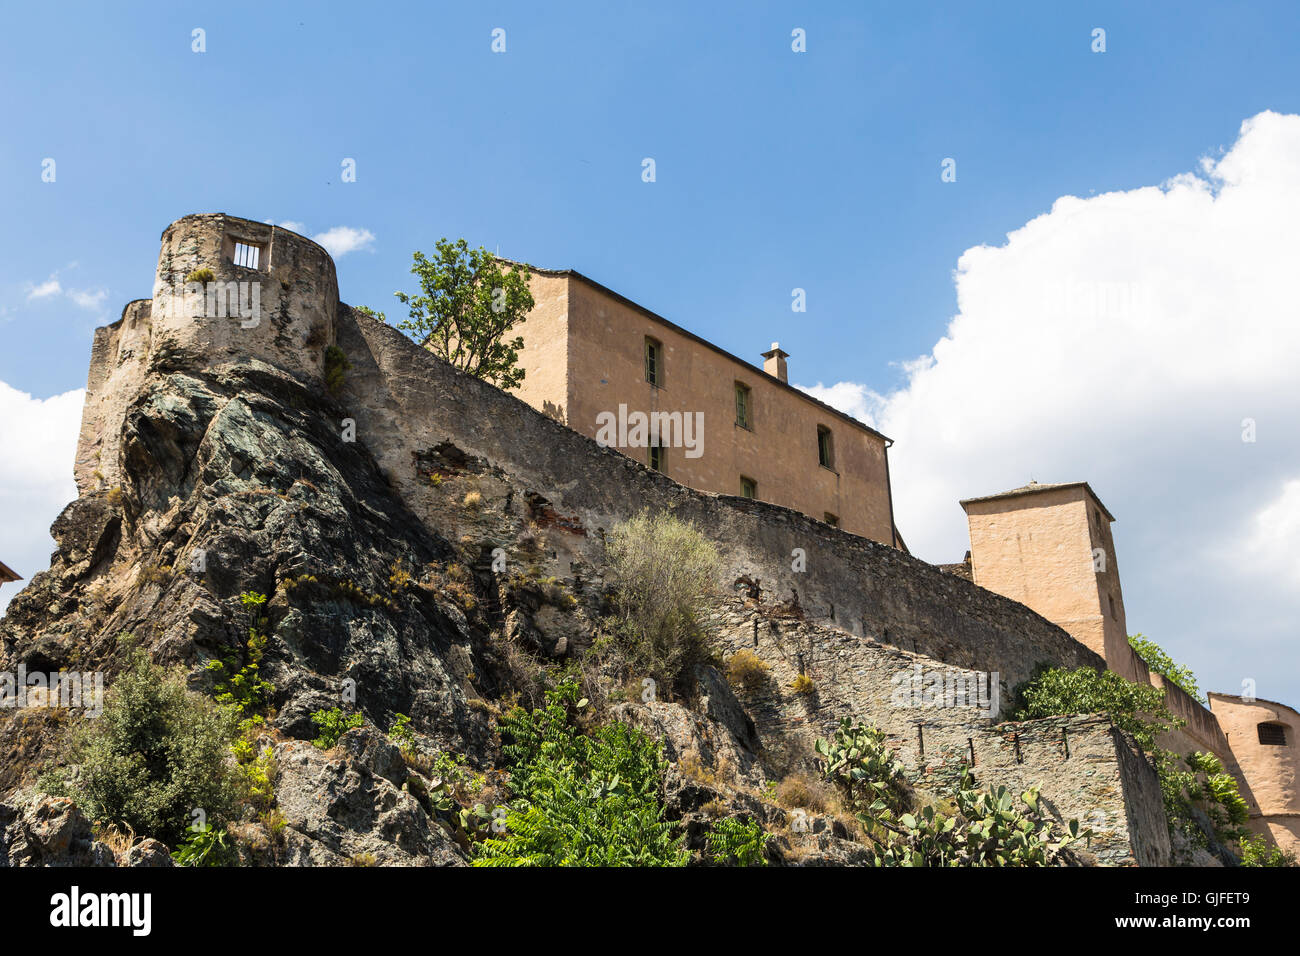 Corte citadel in Corsica island, a popular travel destination in France. - Stock Image